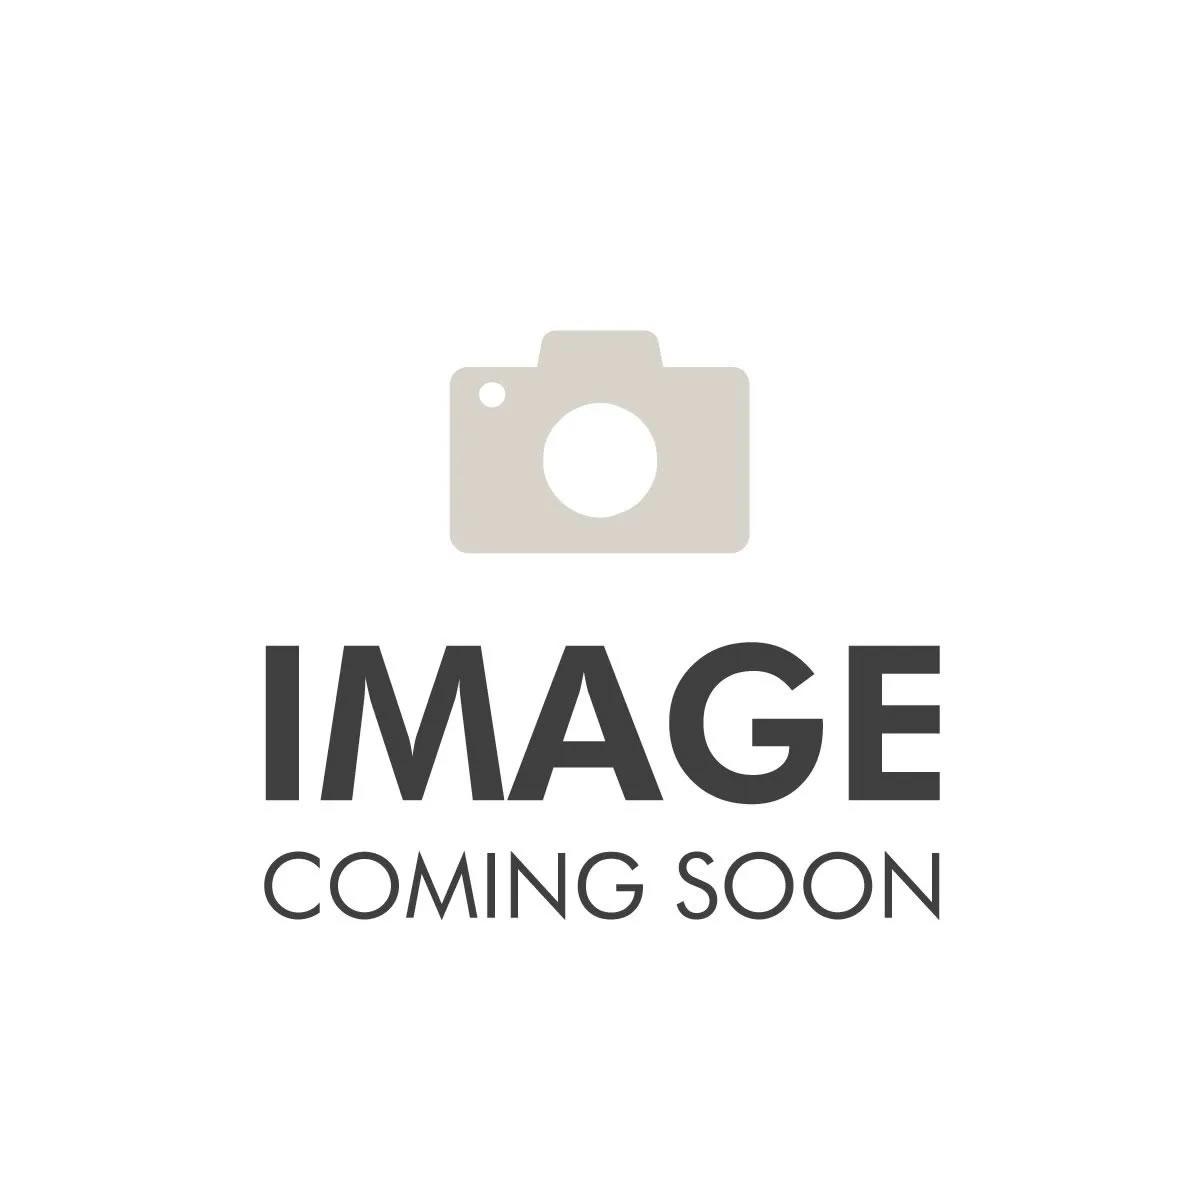 Mesh Summer Brief, 10-18 Jeep Wrangler JK